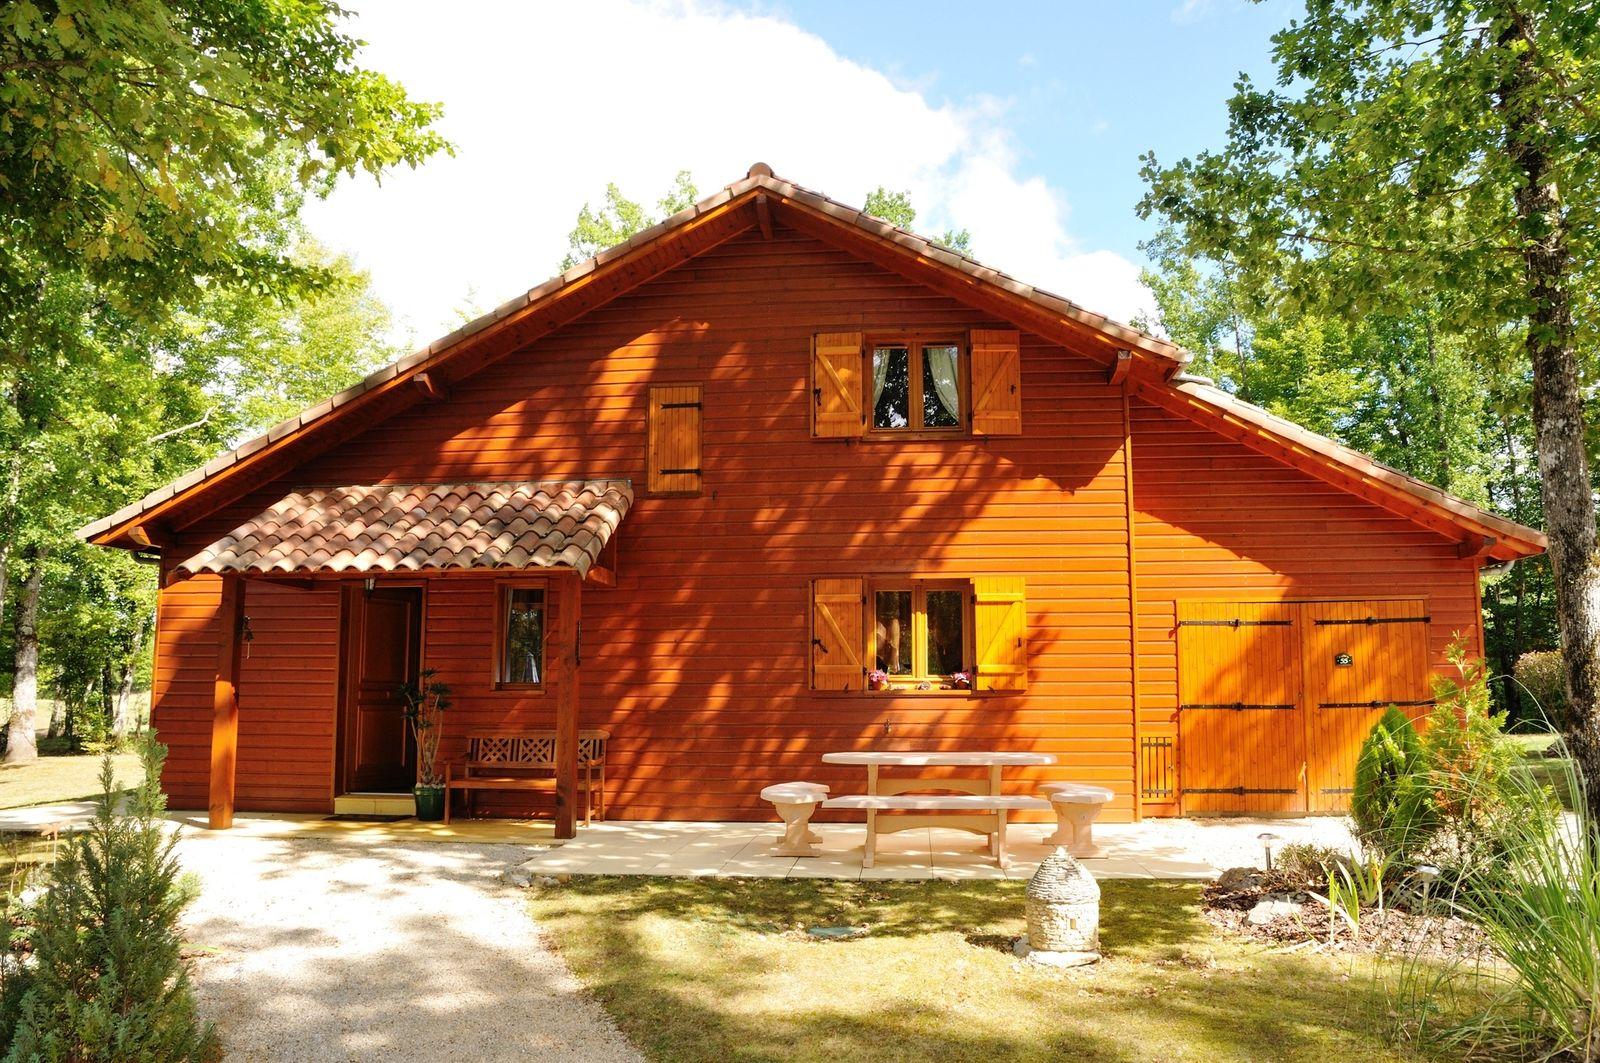 Afbeelding van Souillac Country Club - vakantiehuis Dordogne Confort